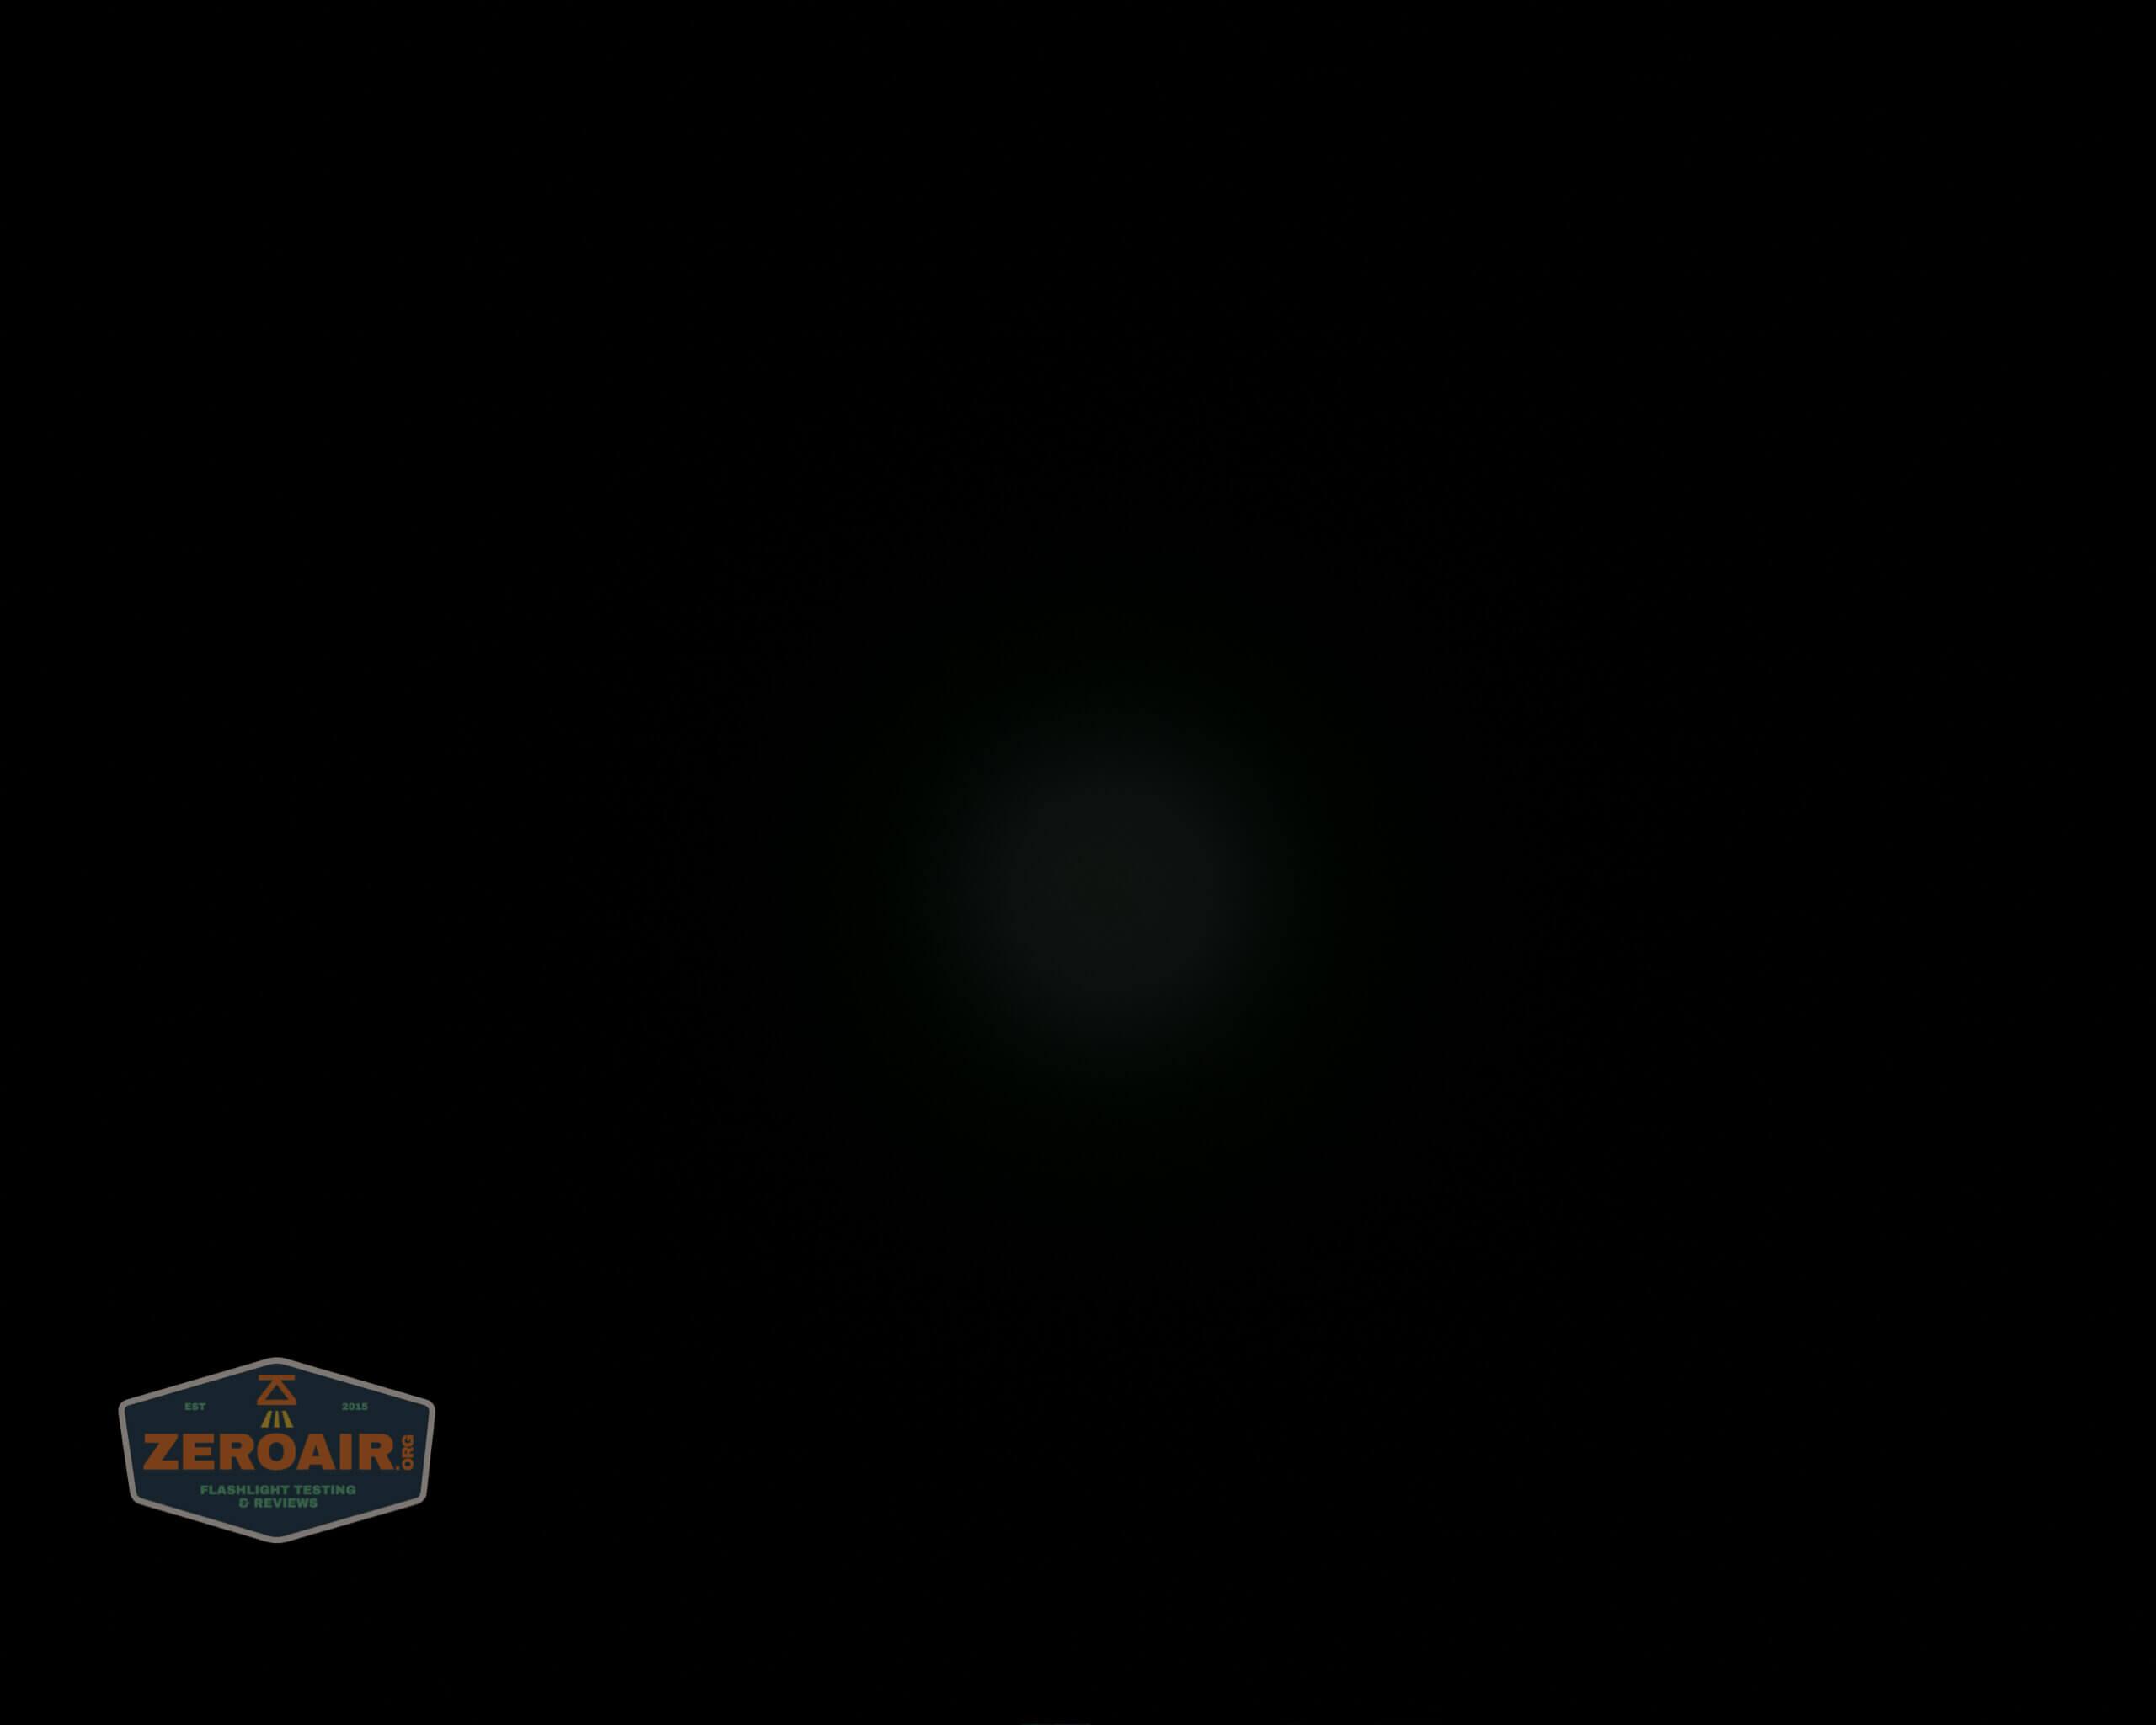 skilhunt m300 18650 flashlight beamshot ceiling 2